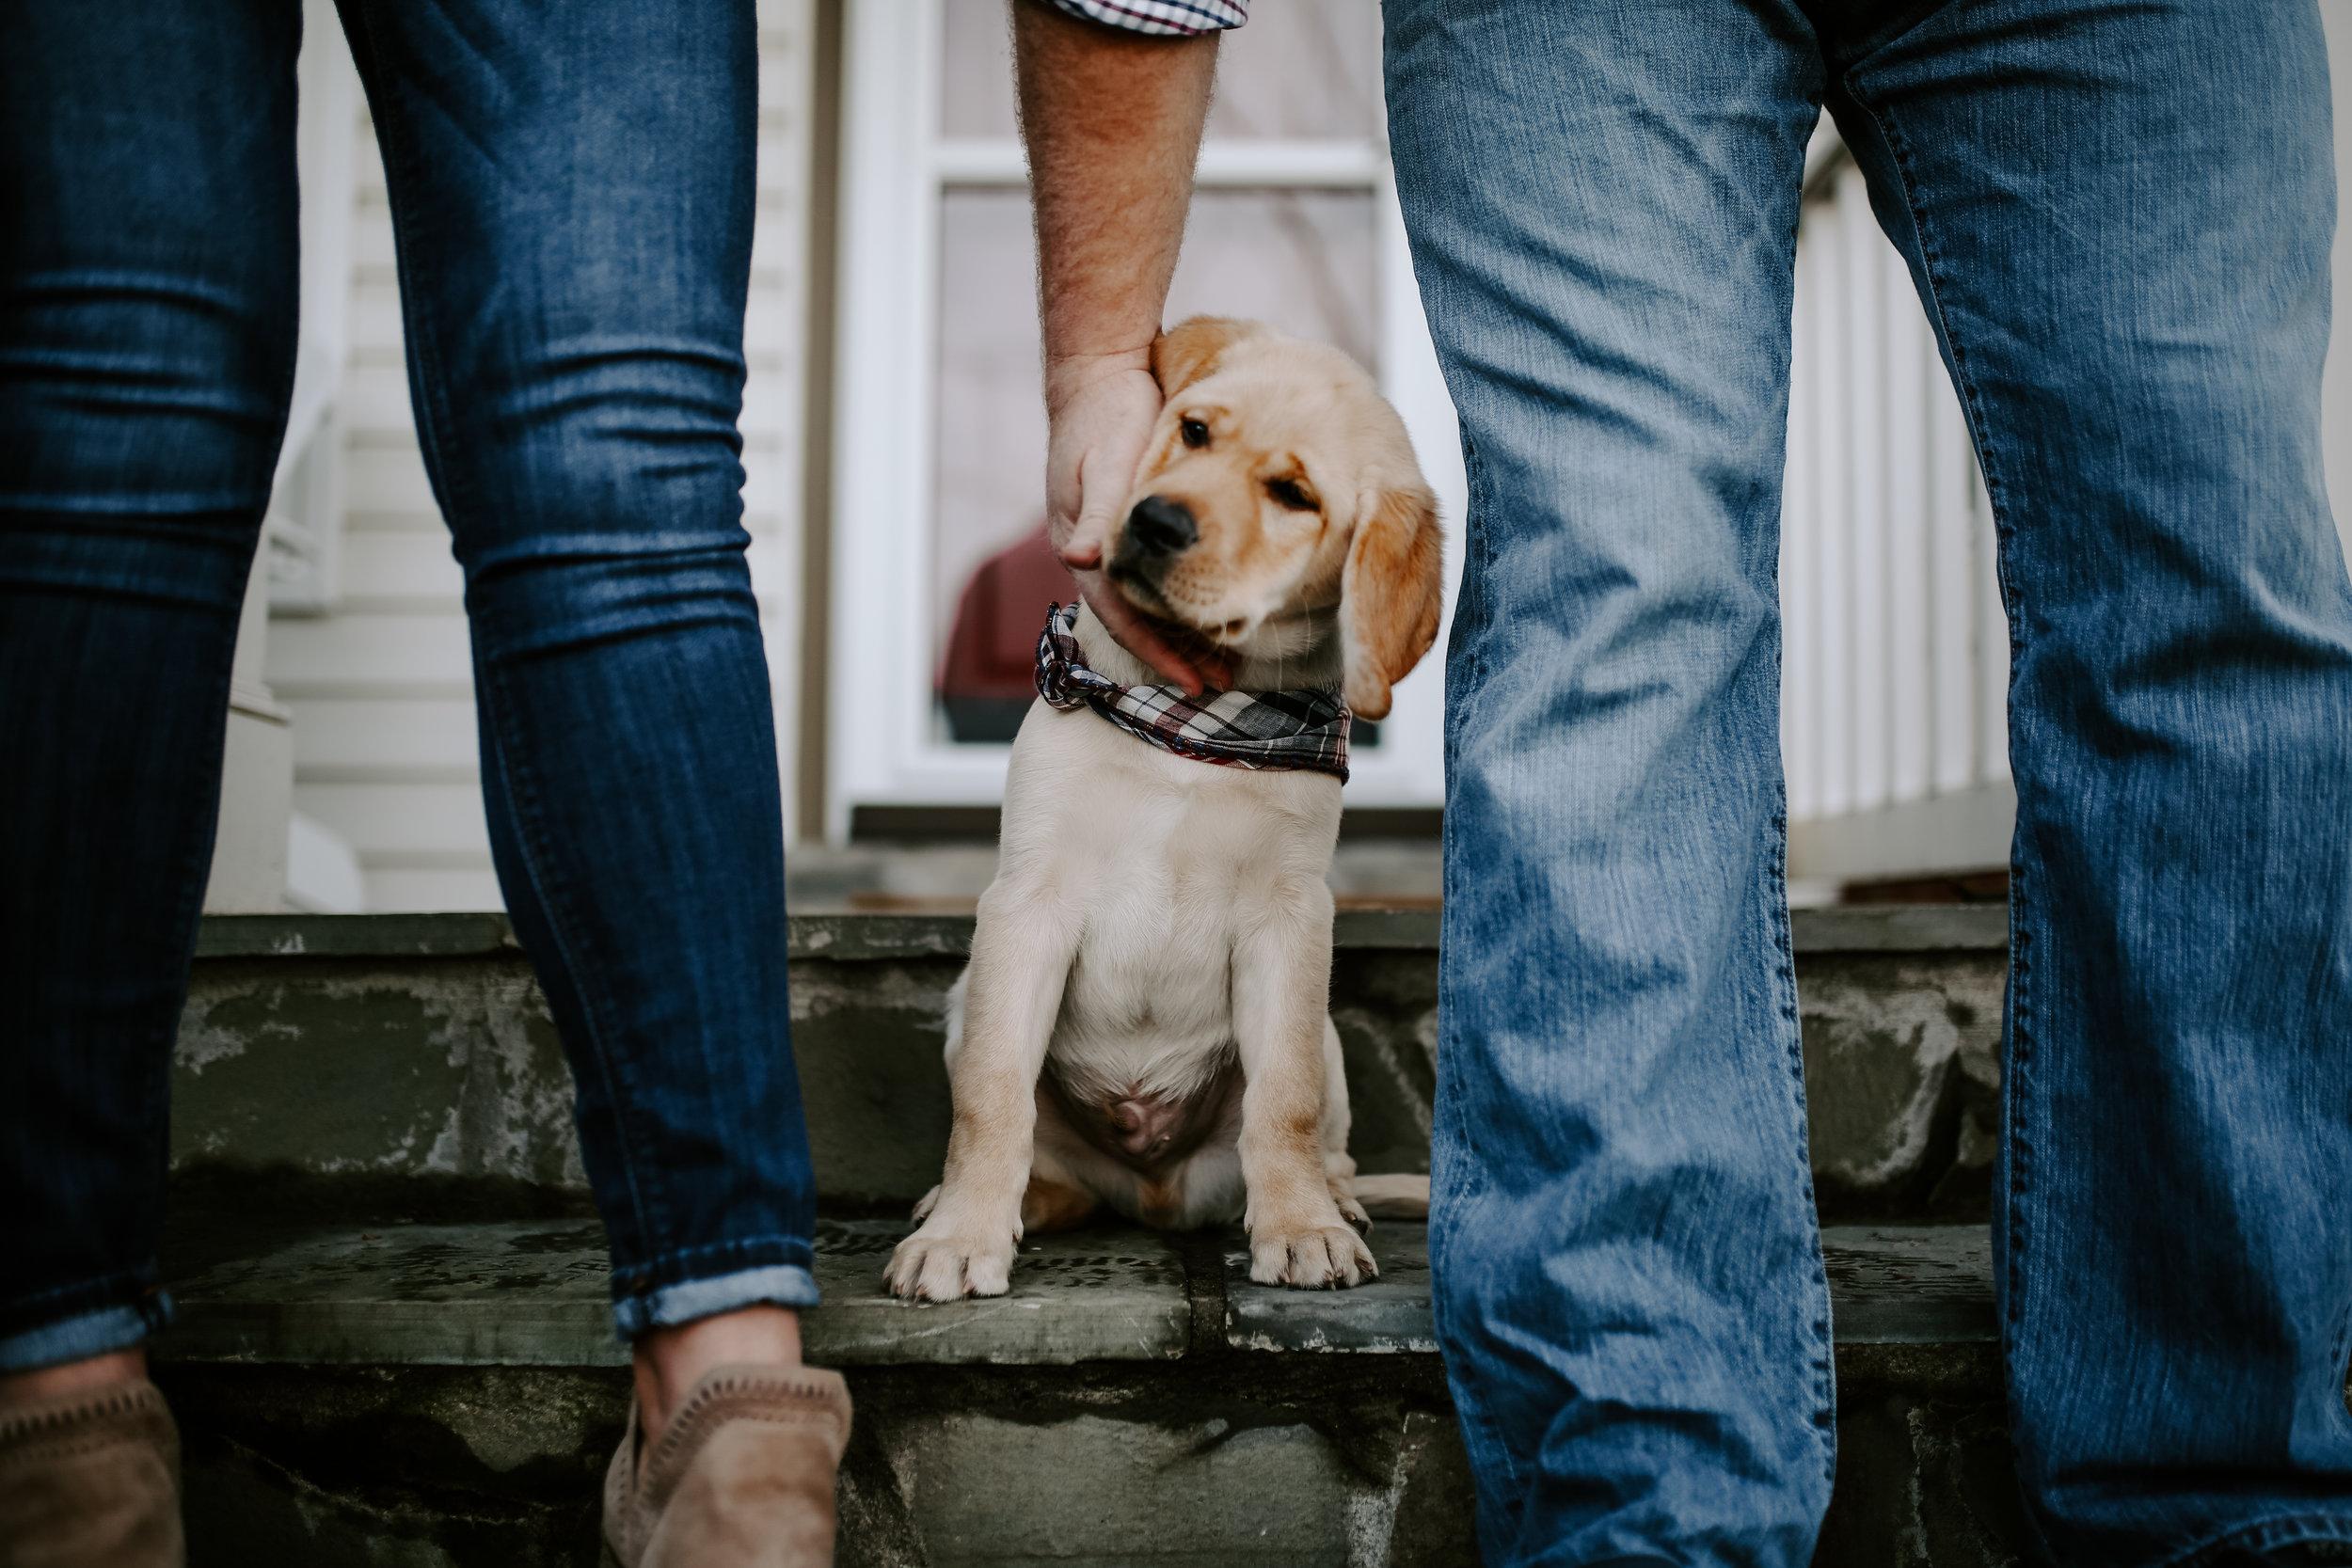 Captain_Puppy_2019-44.jpg